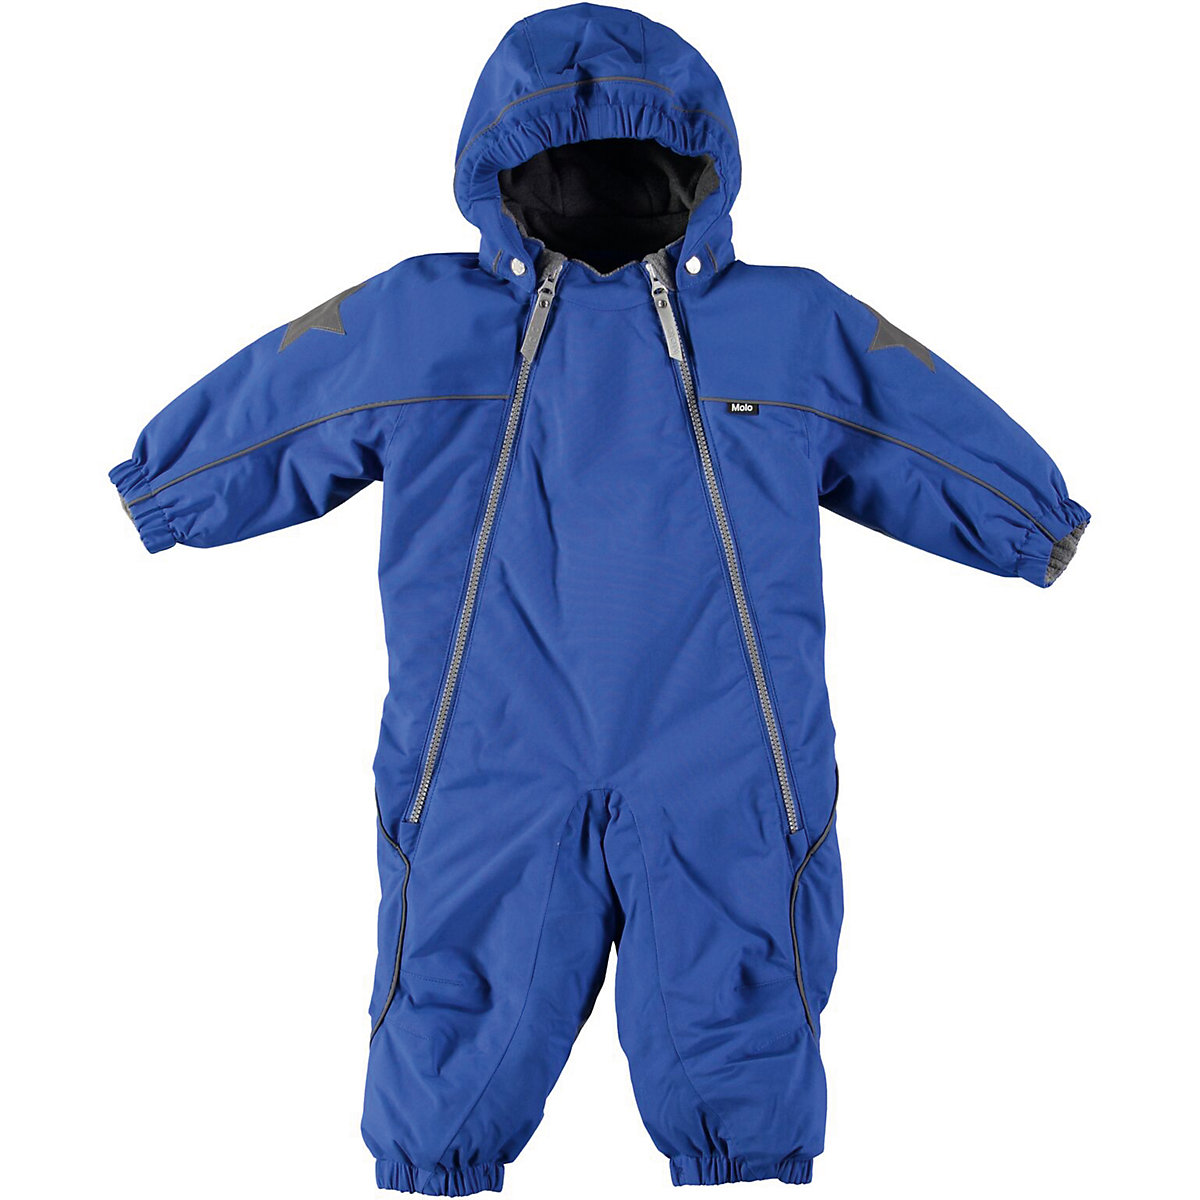 Overalls MOLO for boys 9170716 Baby Rompers Jumpsuit Children clothes Kids newborn baby boy girl infant warm cotton outfit jumpsuit romper bodysuit clothes